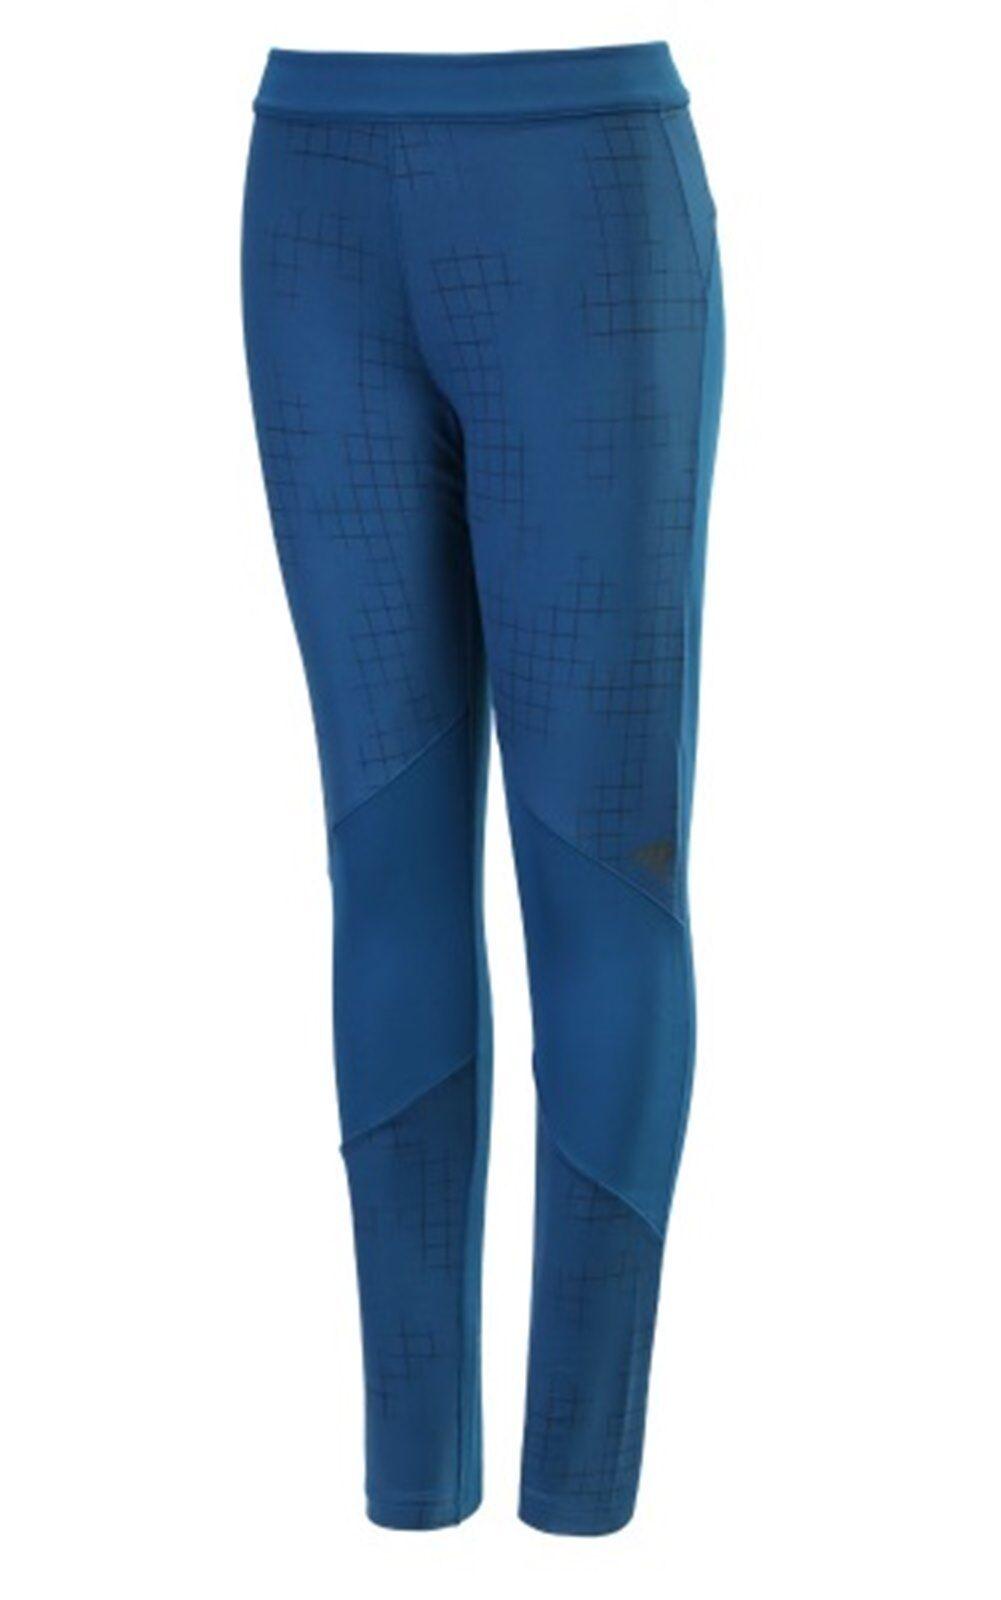 Adidas Women Tech-fit Long Climawarm Pants Training Tight Fitness Pant AY6119